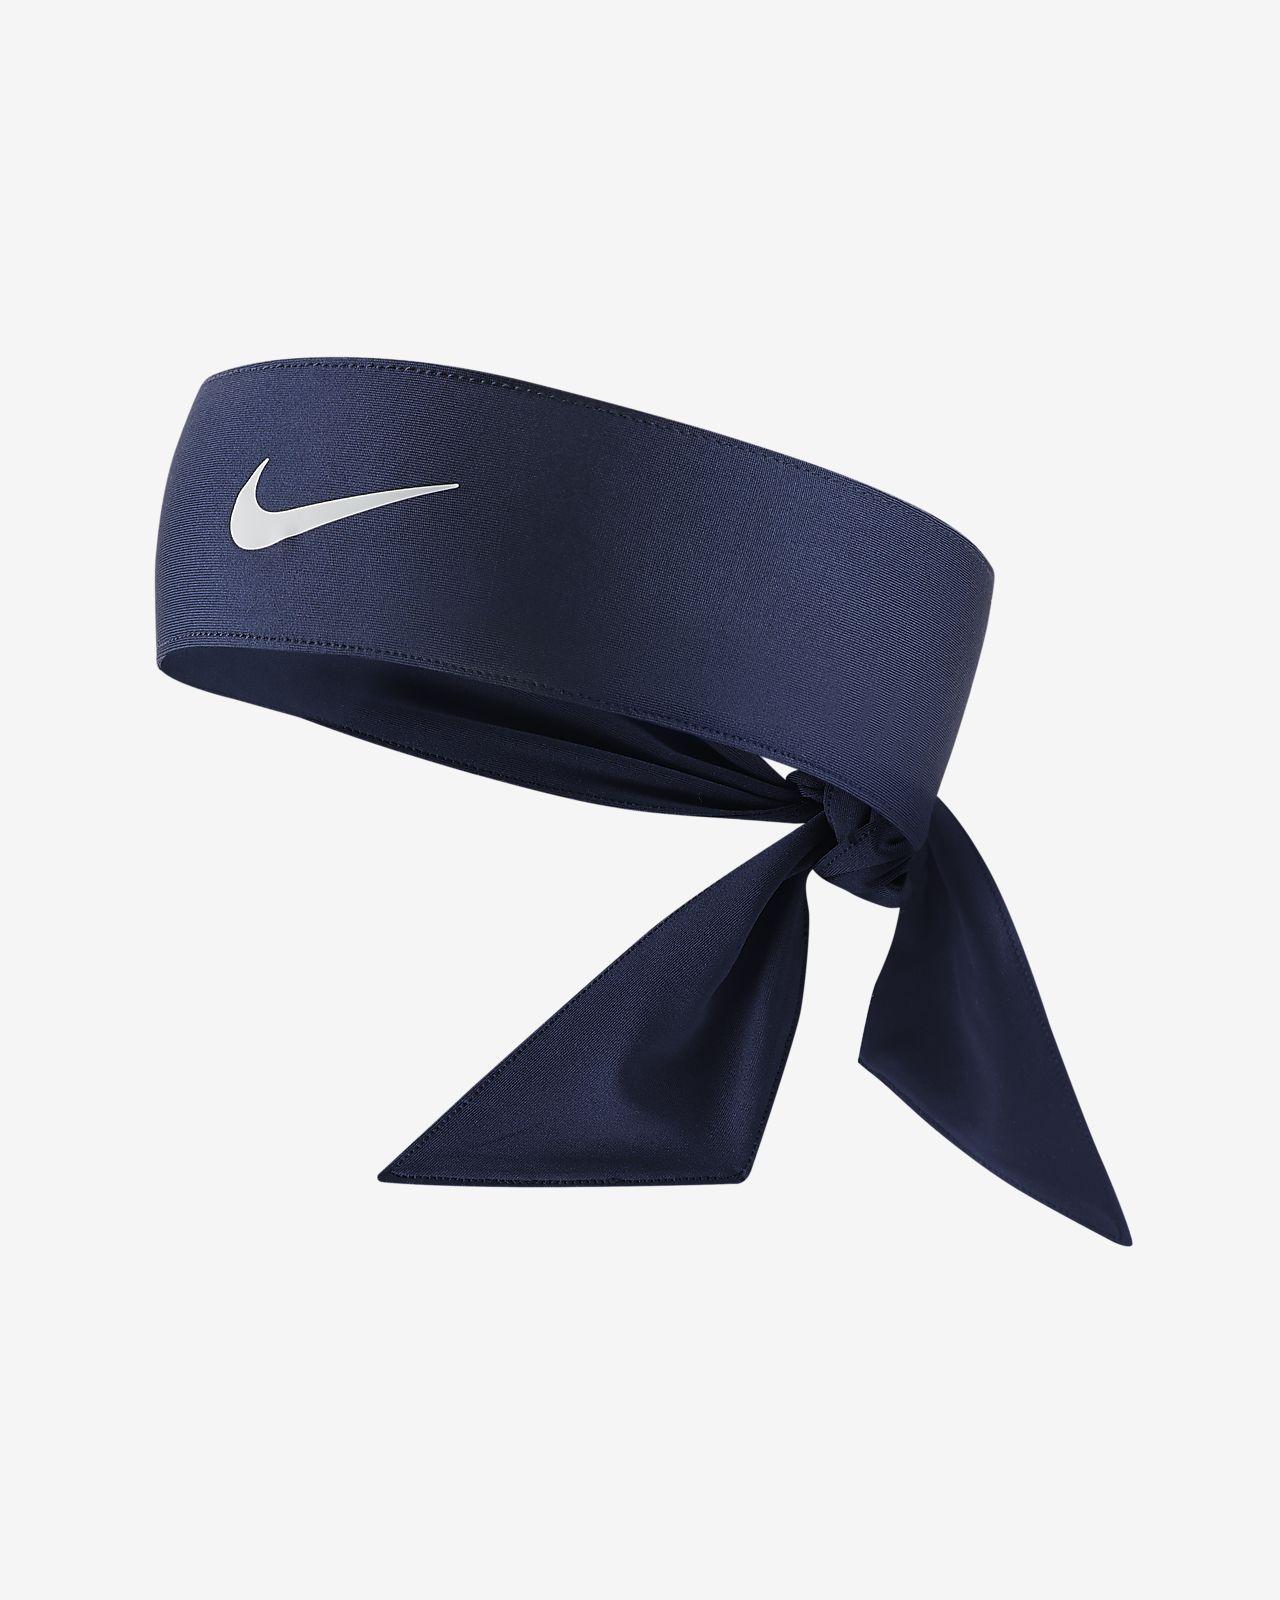 Nike Dri-FIT Cinta per al cap 3.0